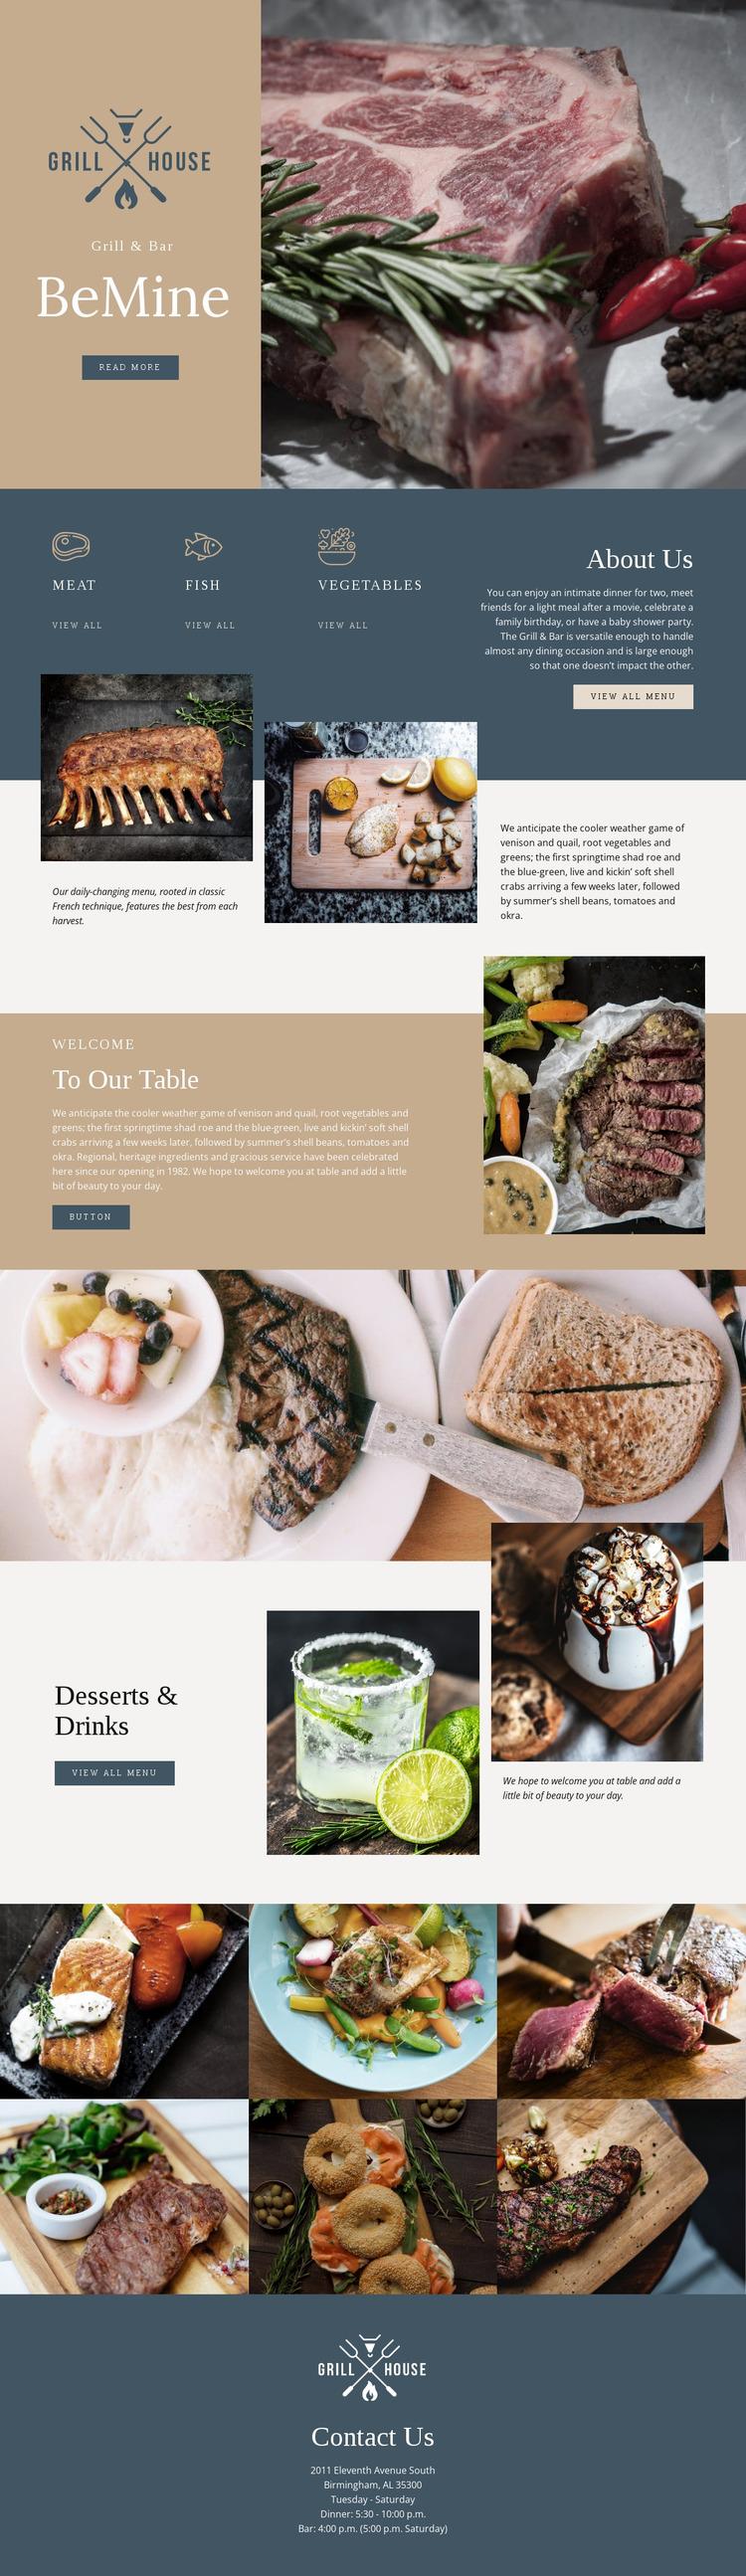 Finest grill house restaurant Html Website Builder